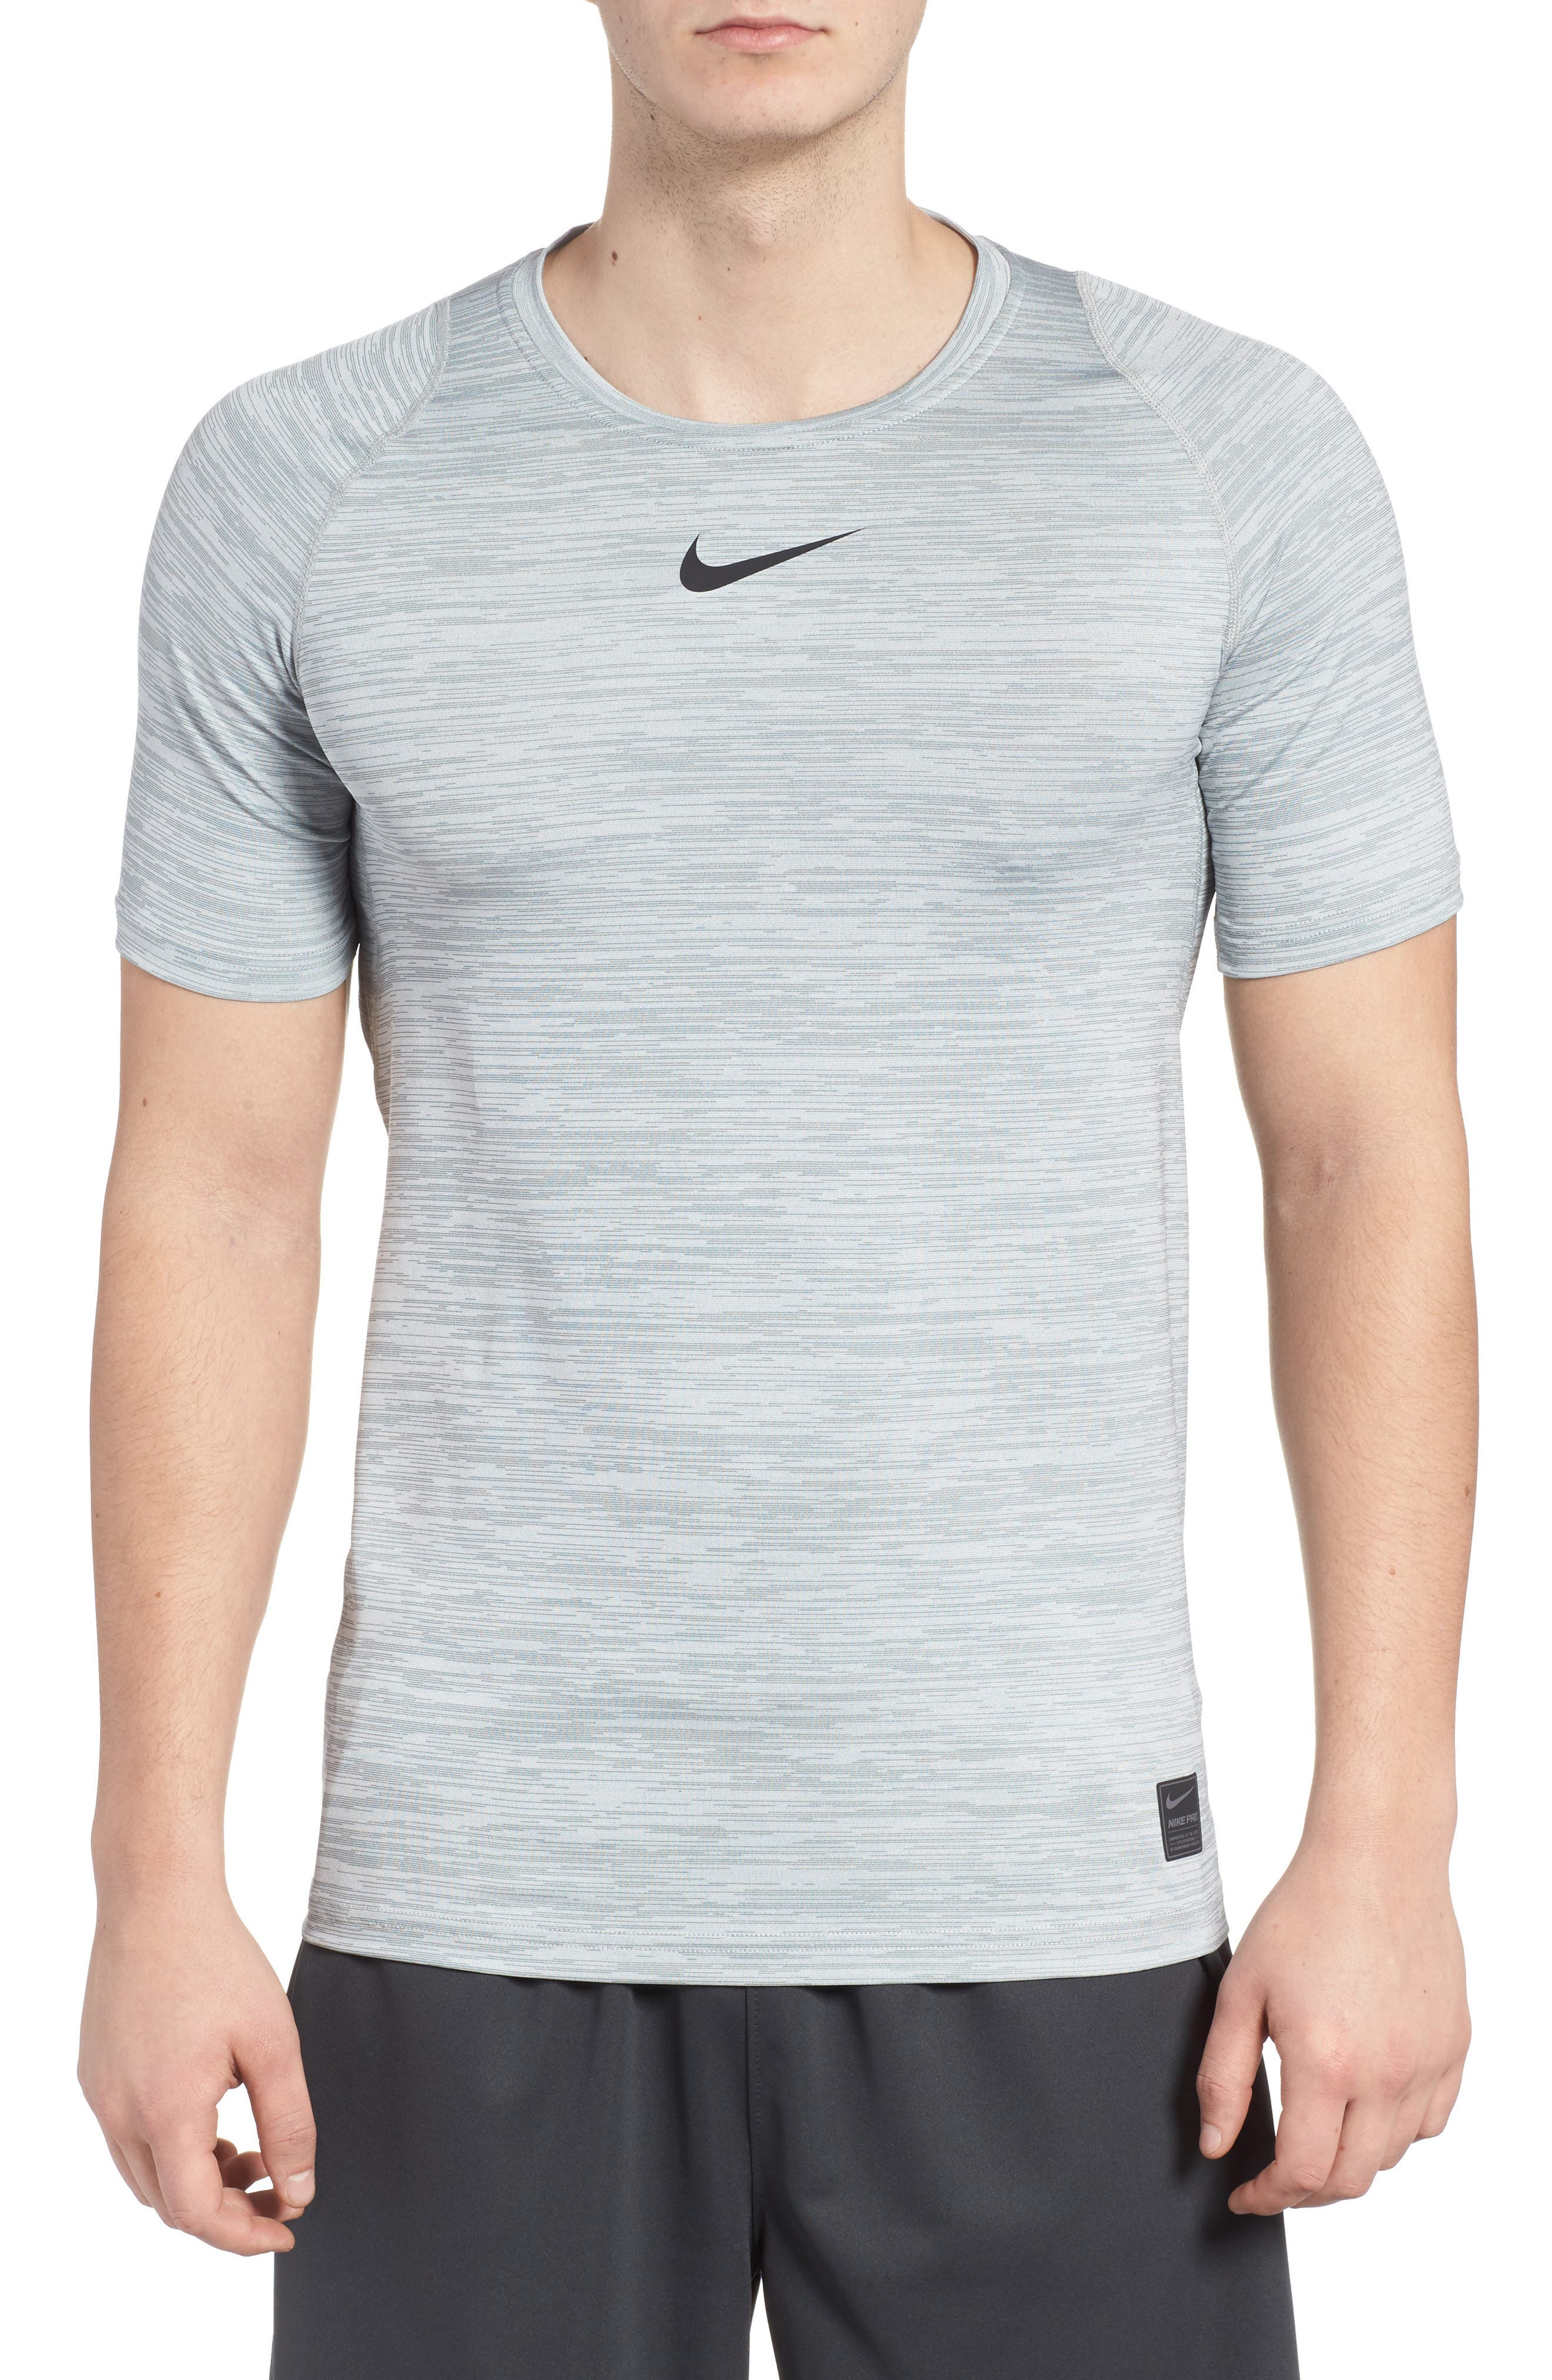 Training Top Crewneck T-Shirt,                         Main,                         color, Cool Grey/ White/ Black